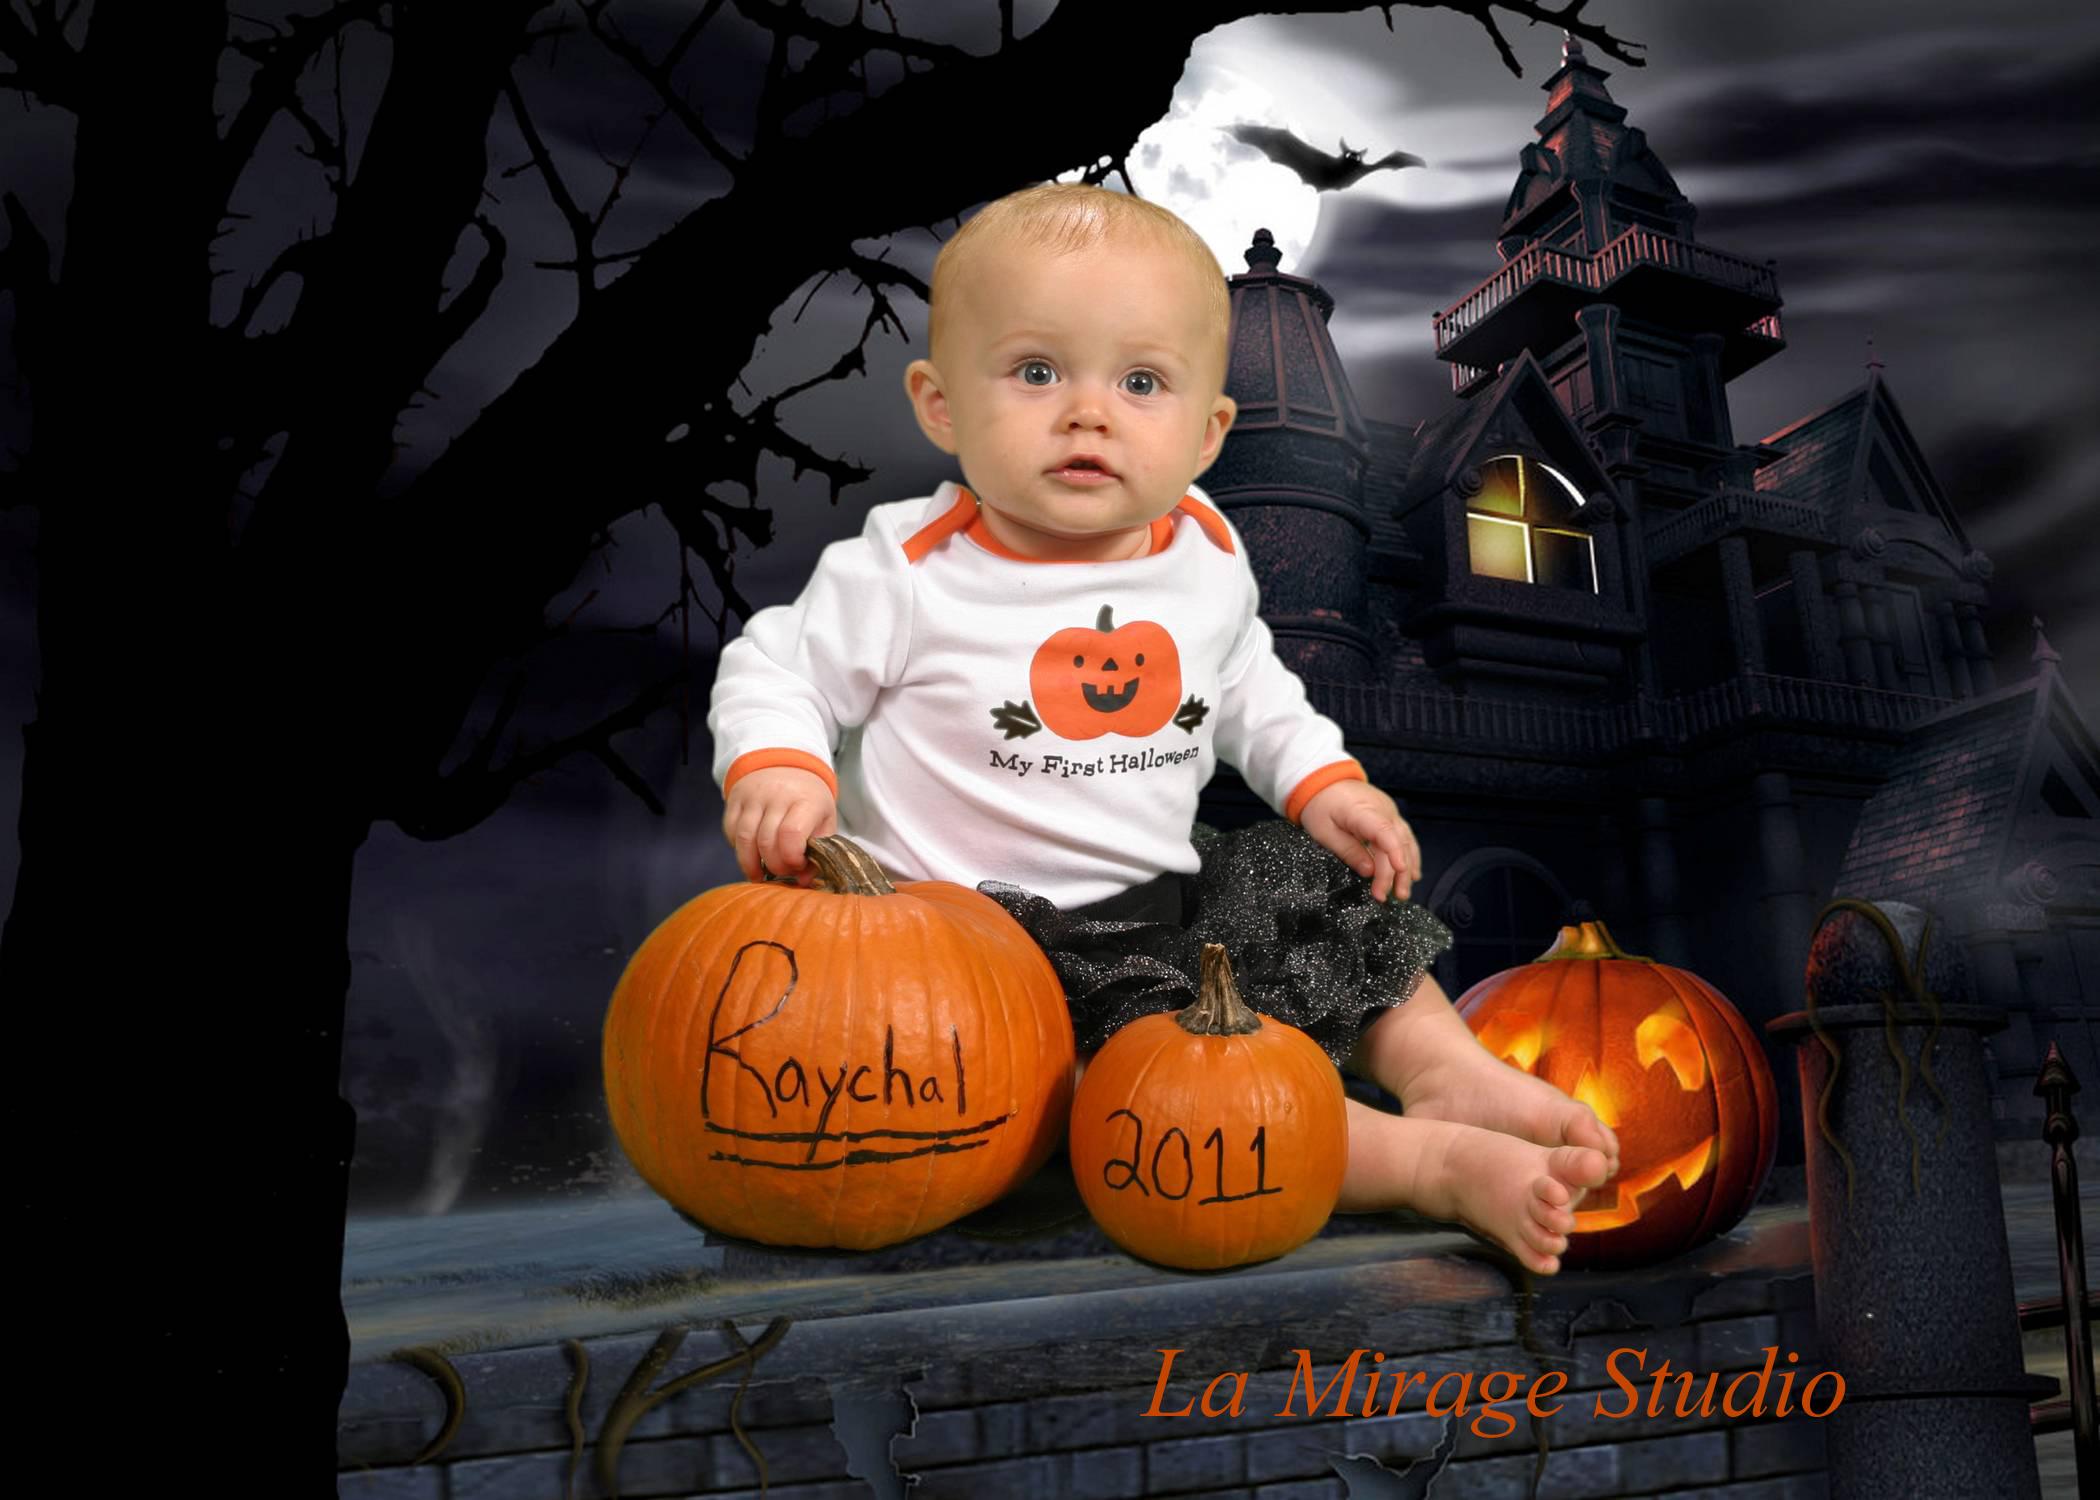 Raychal Halloween